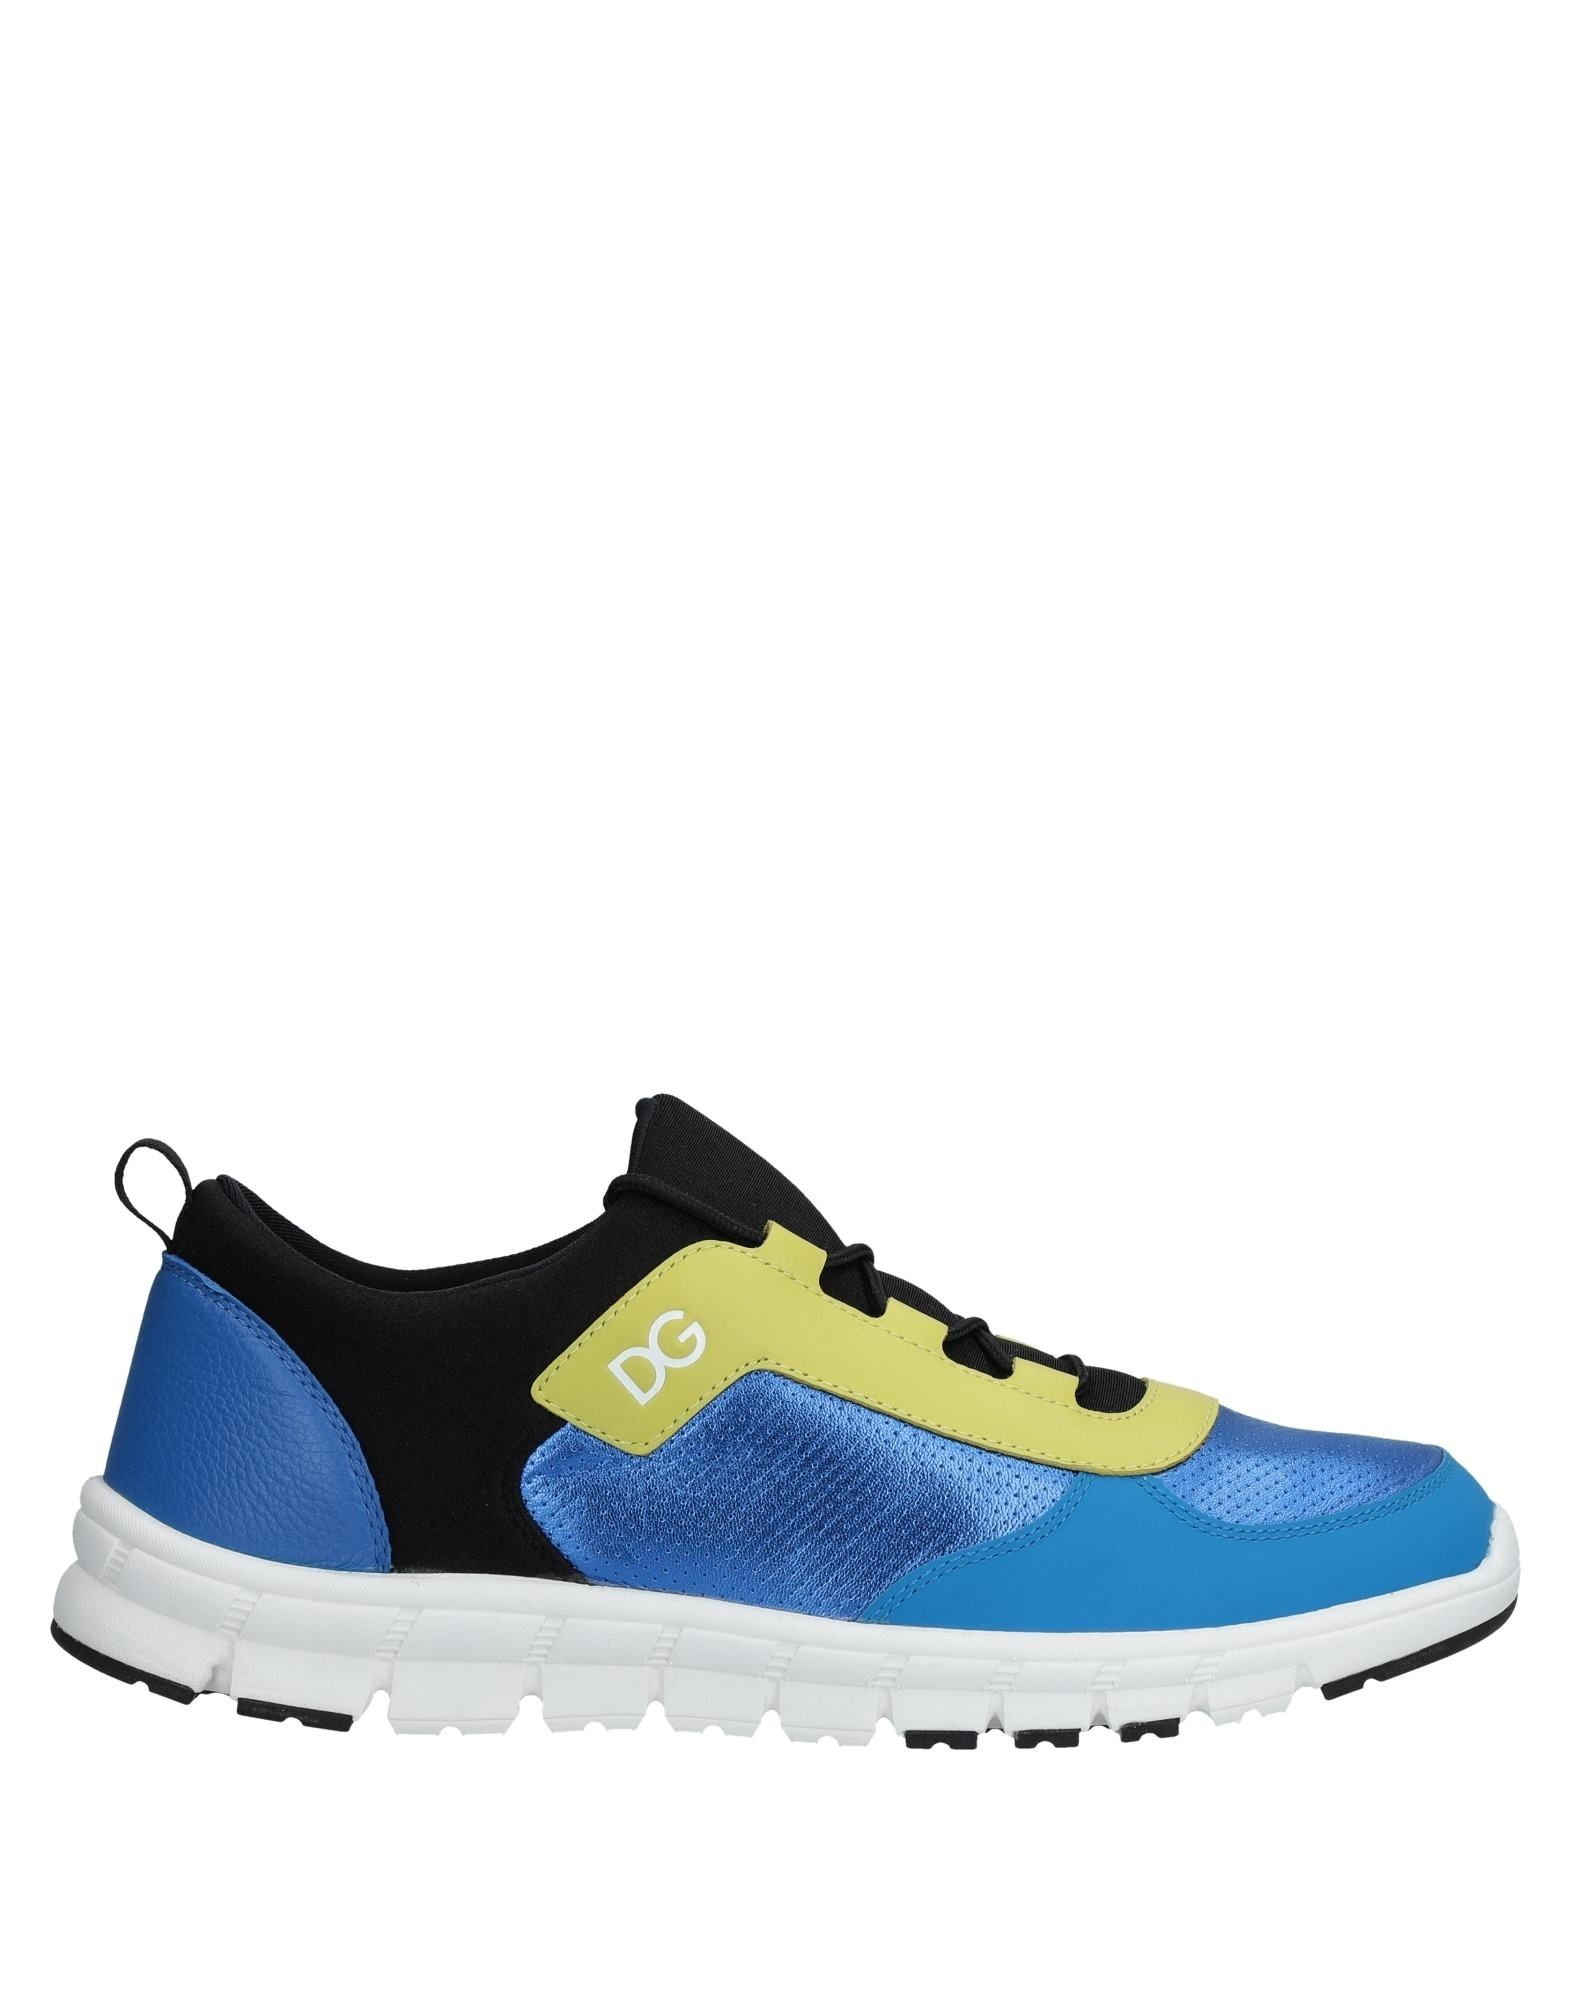 Dolce & Gabbana Sneakers Herren  11544035XM Gute Qualität beliebte Schuhe